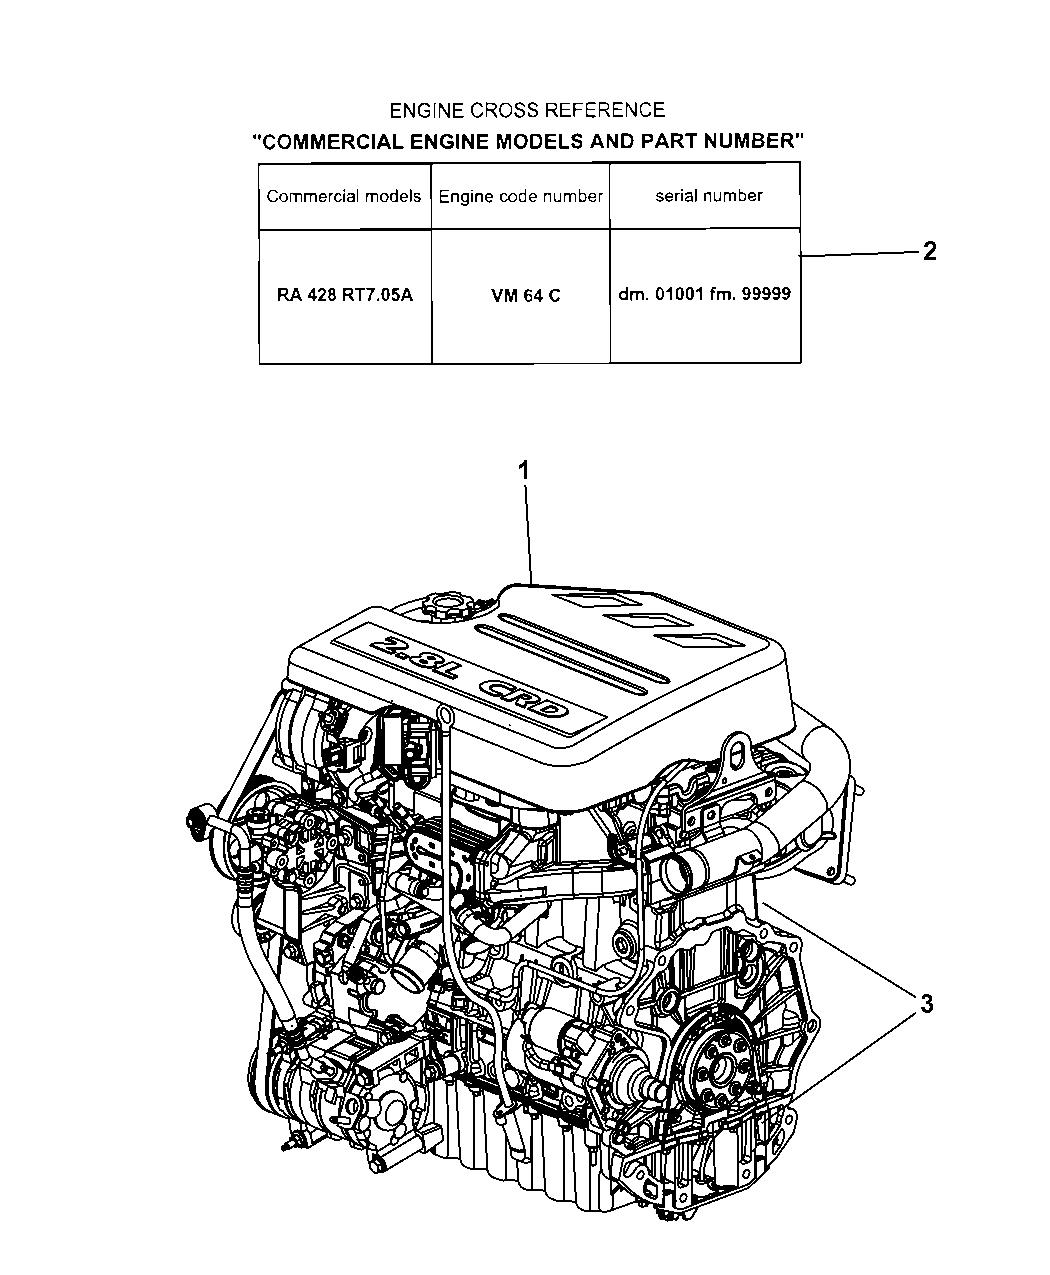 Jeep Wrangler Engine Diagram Engine Schematics And Wiring Diagrams